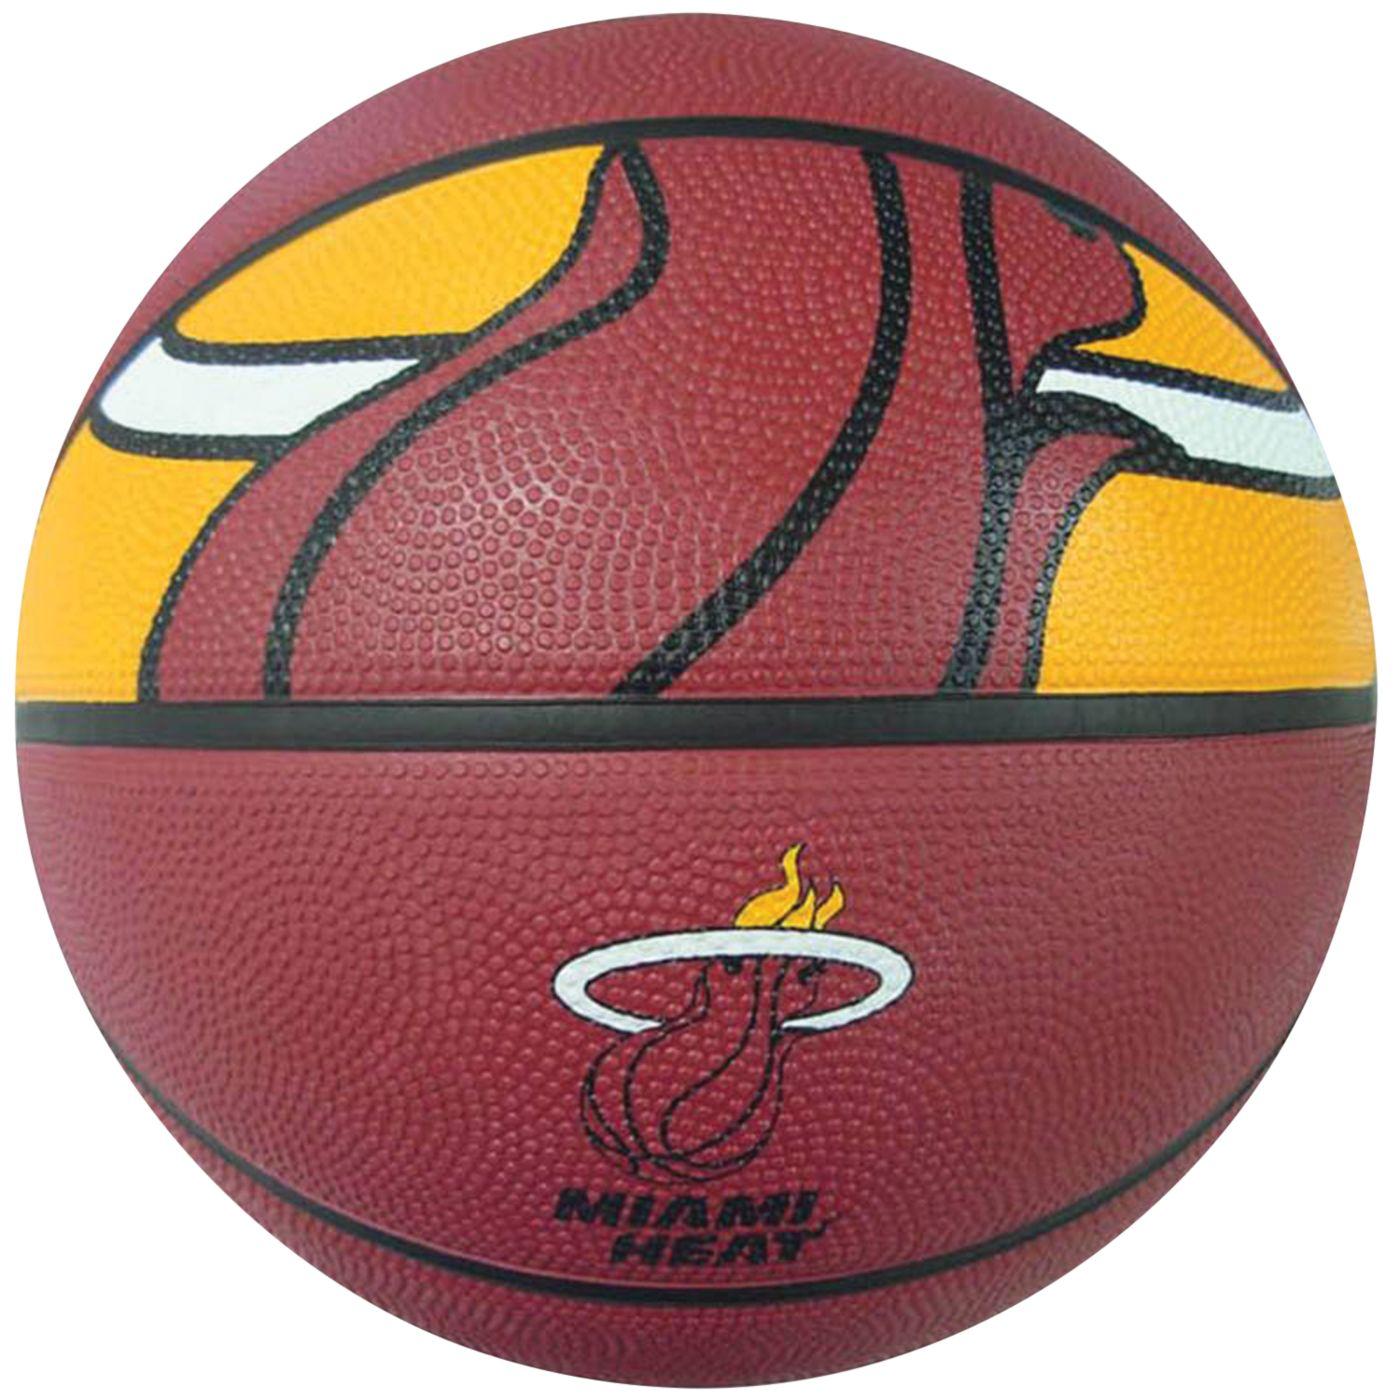 Spalding Miami Heat Full-Sized Court Side Basketball